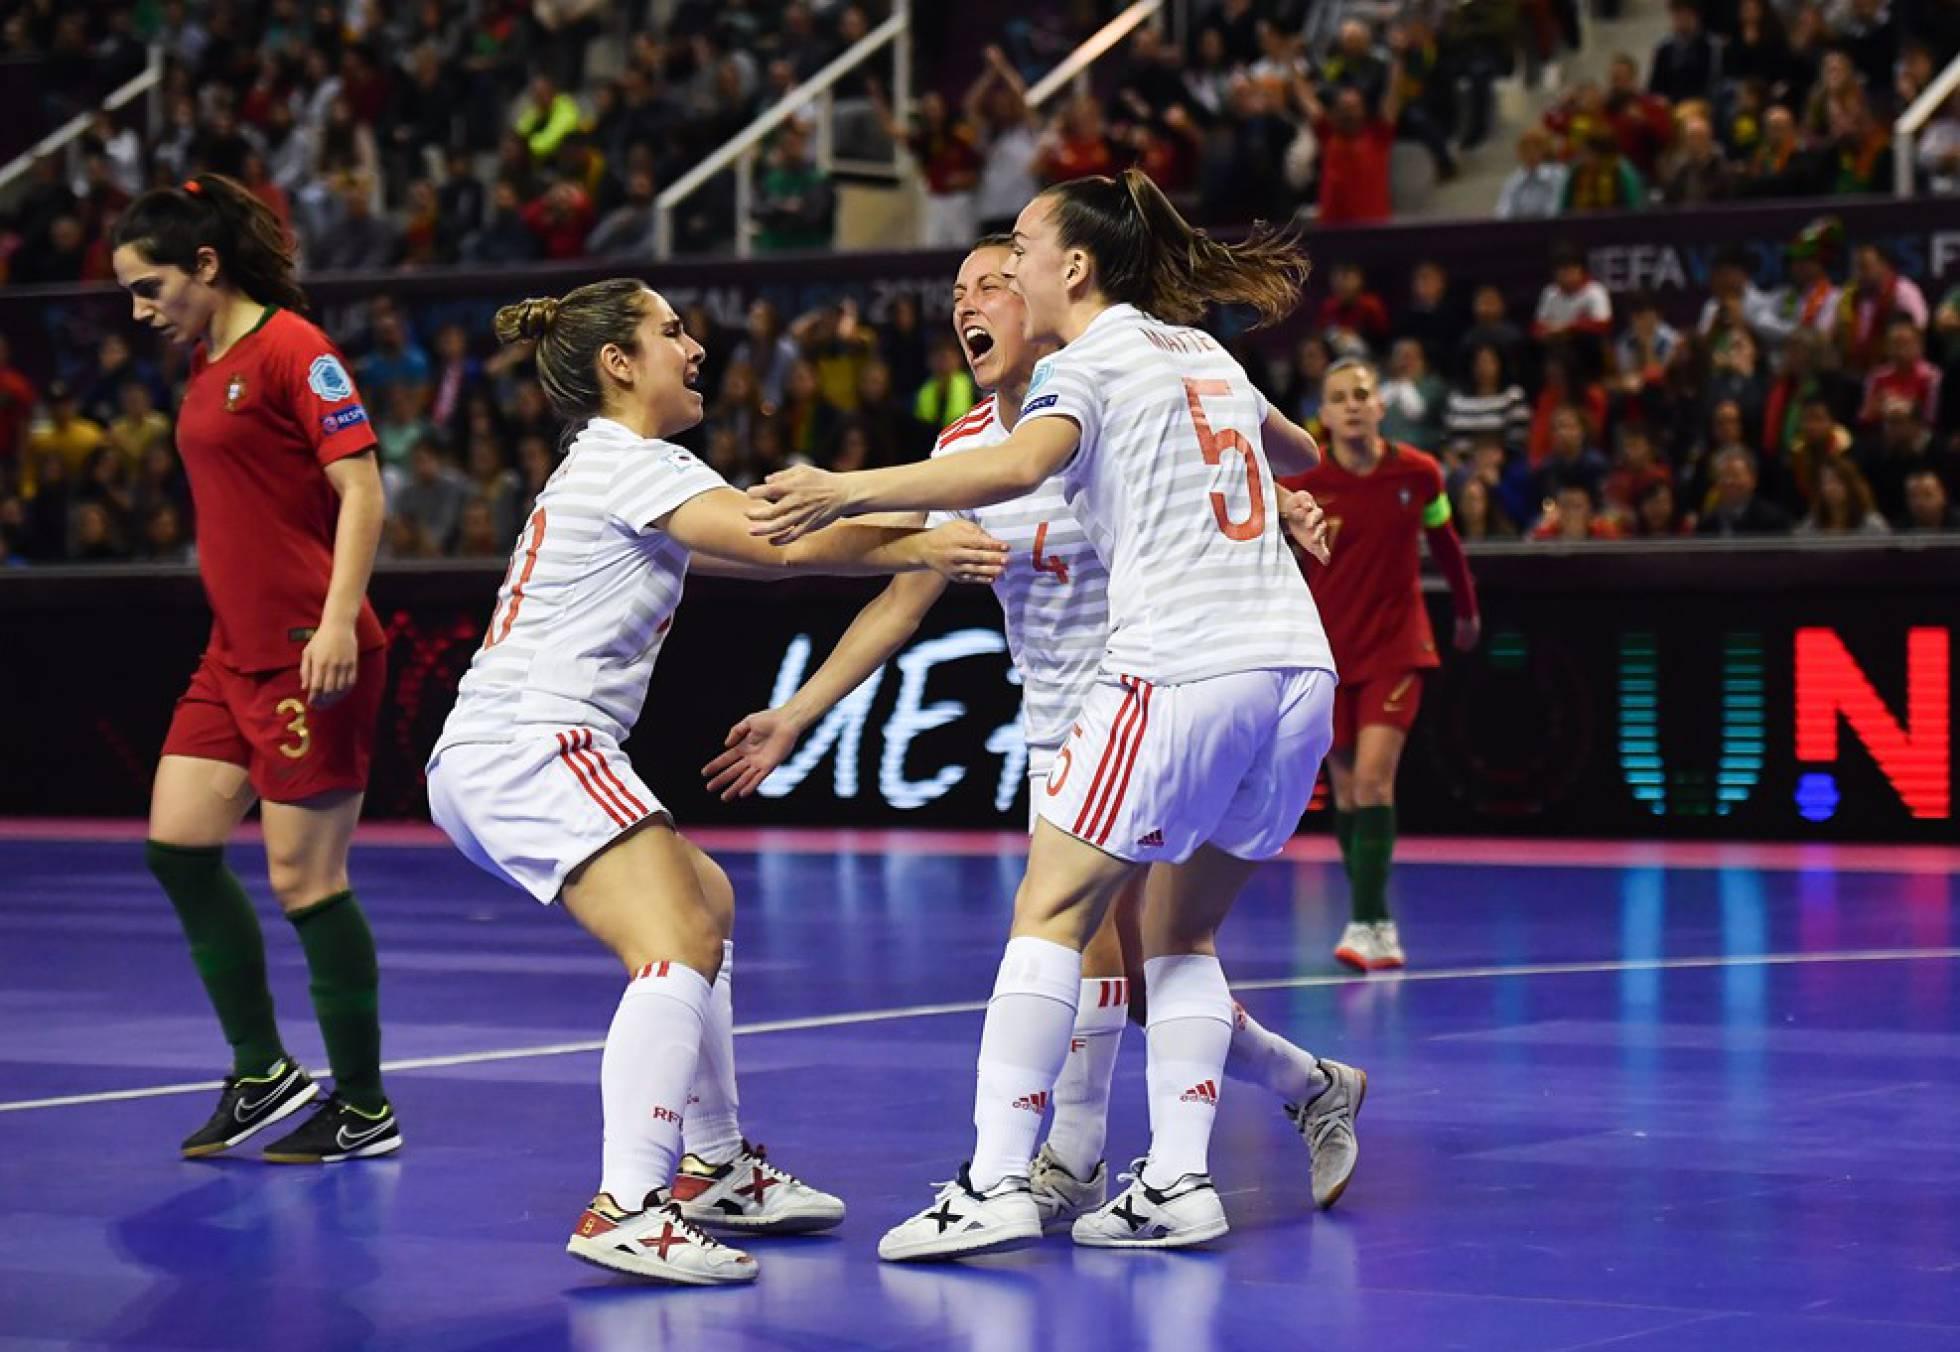 España gana el primer Europeo de fútbol sala femenino